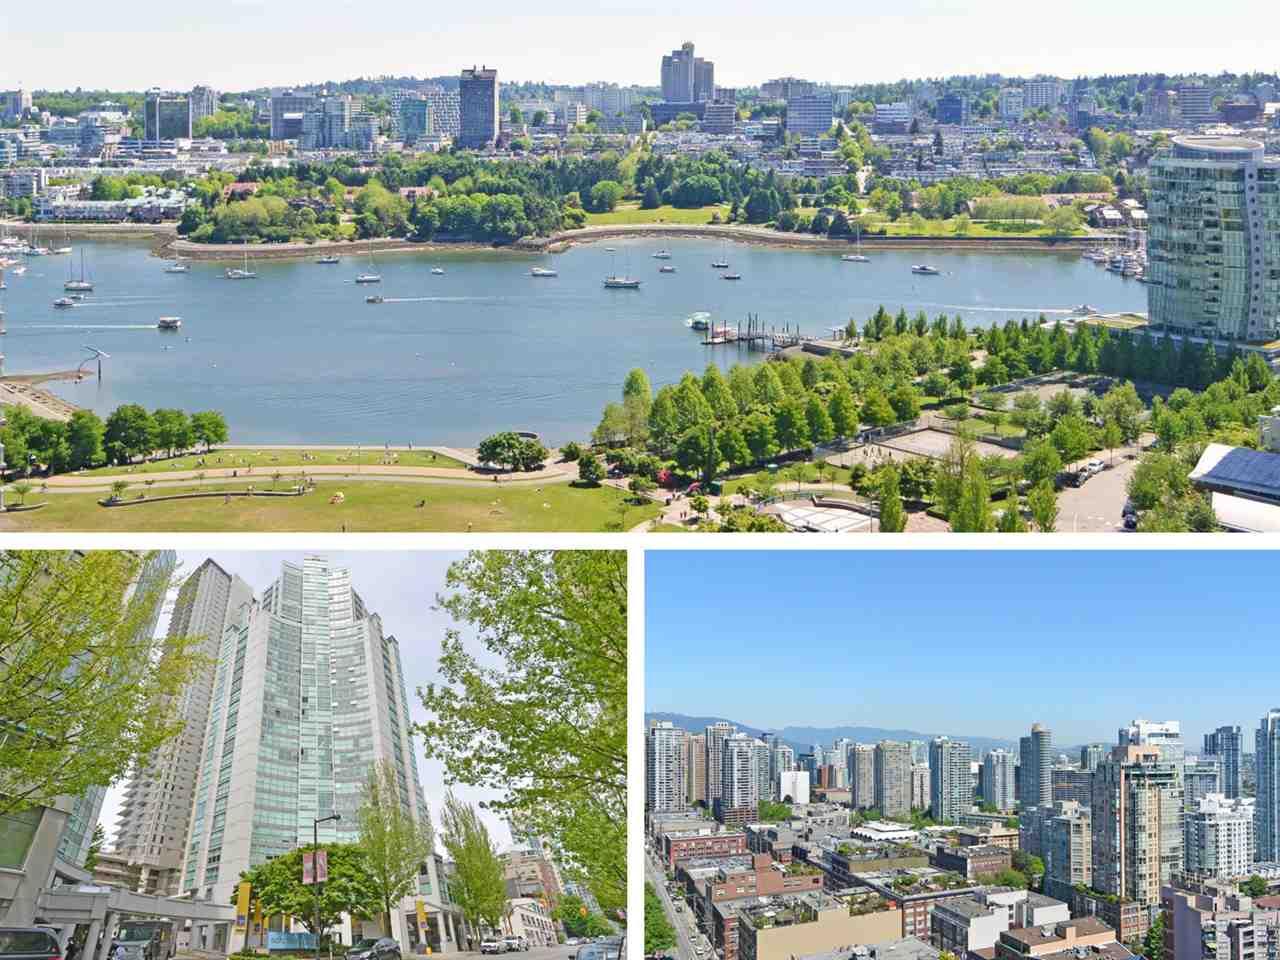 Condo Apartment at 2402 1323 HOMER STREET, Unit 2402, Vancouver West, British Columbia. Image 1